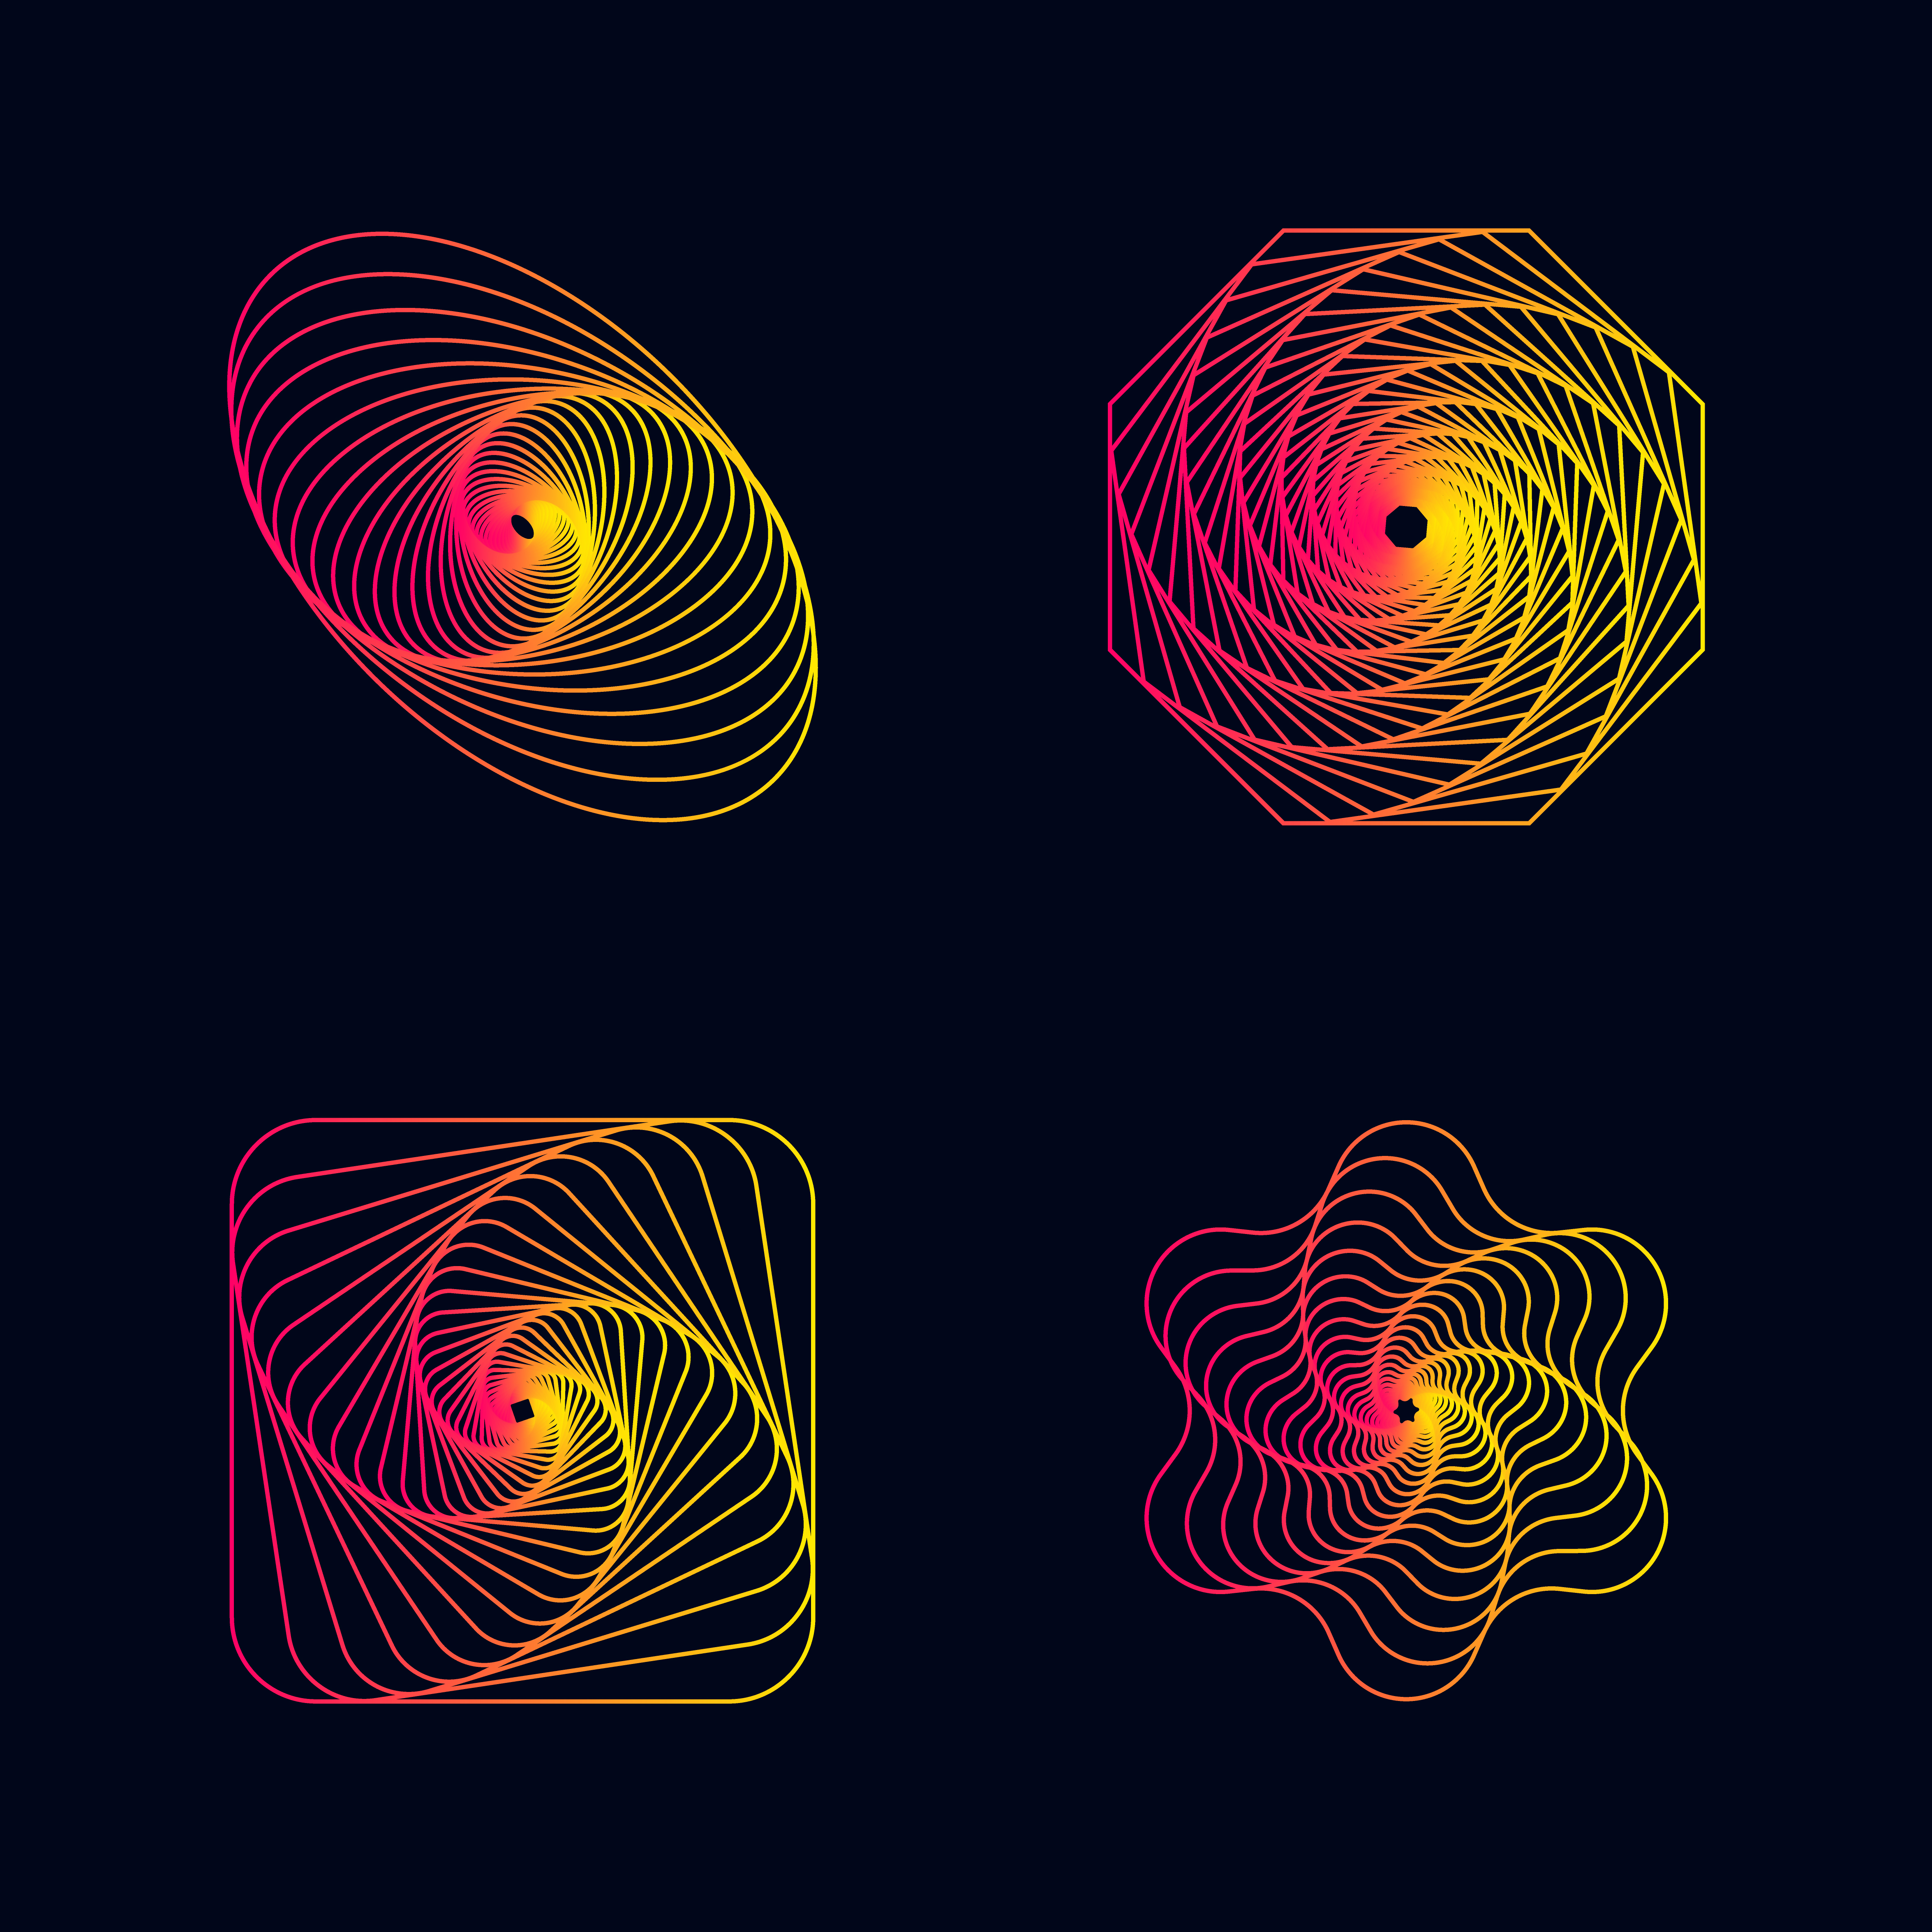 Vector Illustration Web Designs: Gradient Line Spiral Designs Elements